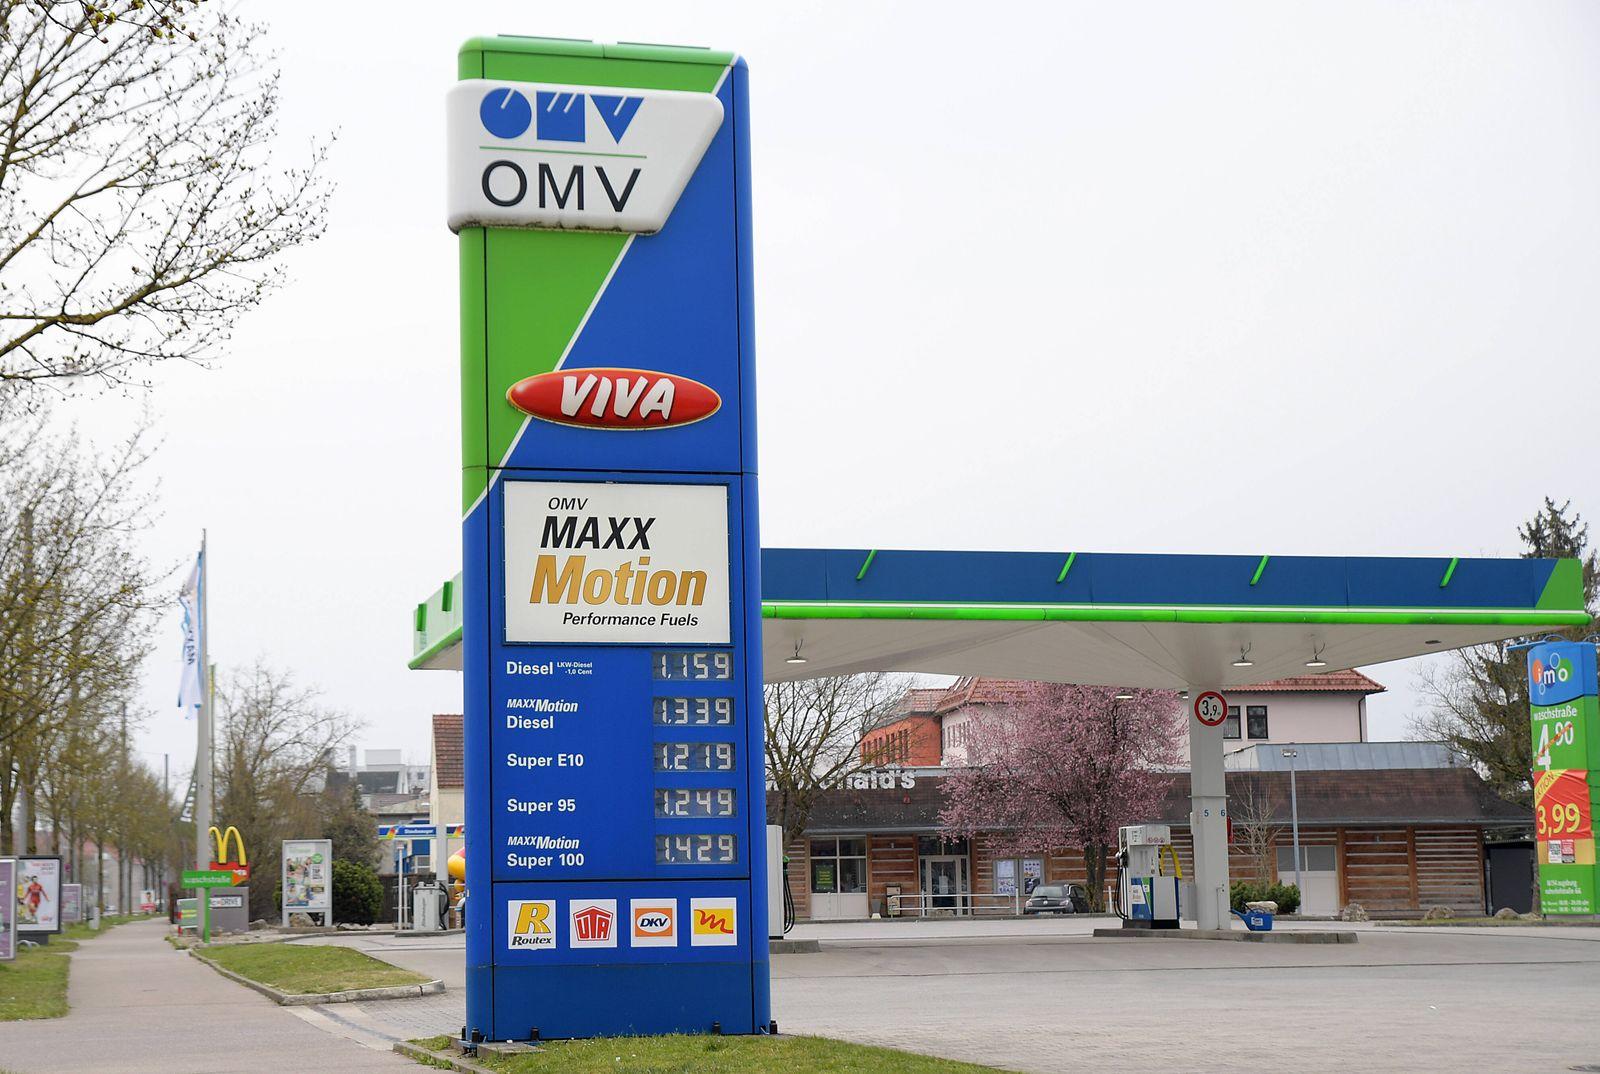 29.03.2020, xemx, News, emwirt, v.l. OMV Tankstelle in Augsburg bei Gersthofen Augsburg *** 29 03 2020, xemx, News, emwi